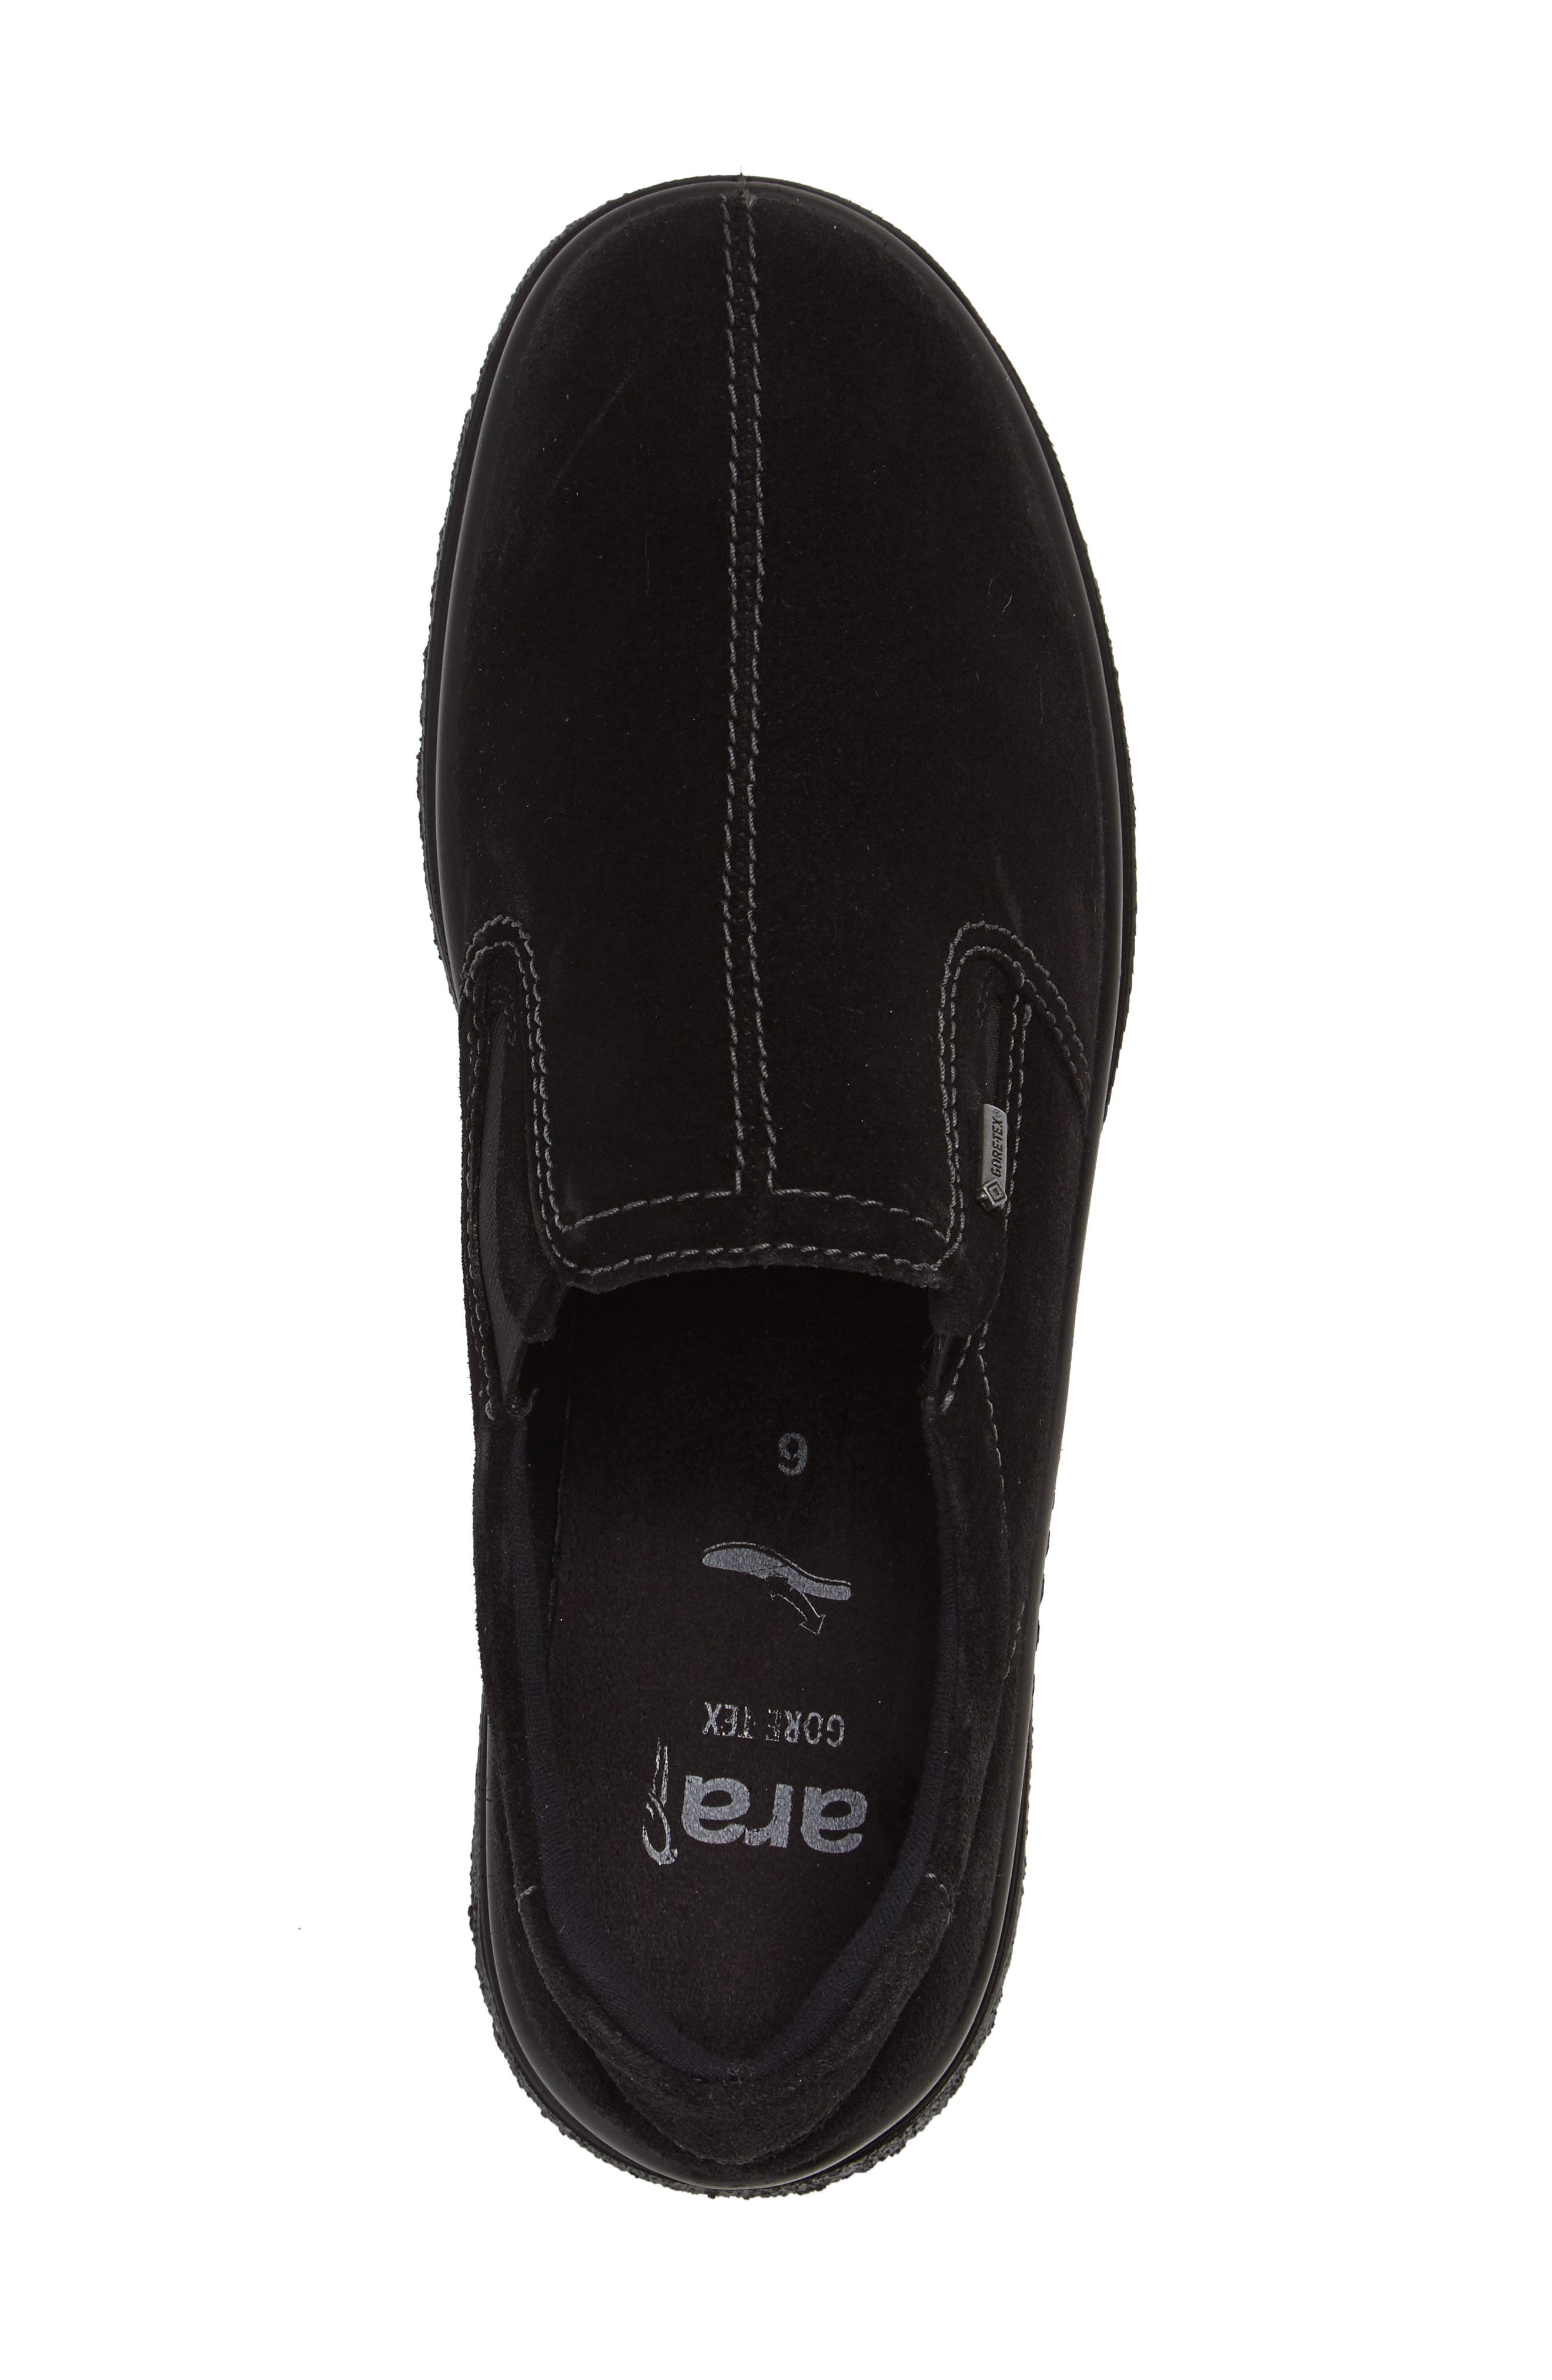 Parson Waterproof Gore-Tex<sup>®</sup> Slip-On Sneaker,                             Alternate thumbnail 3, color,                             001